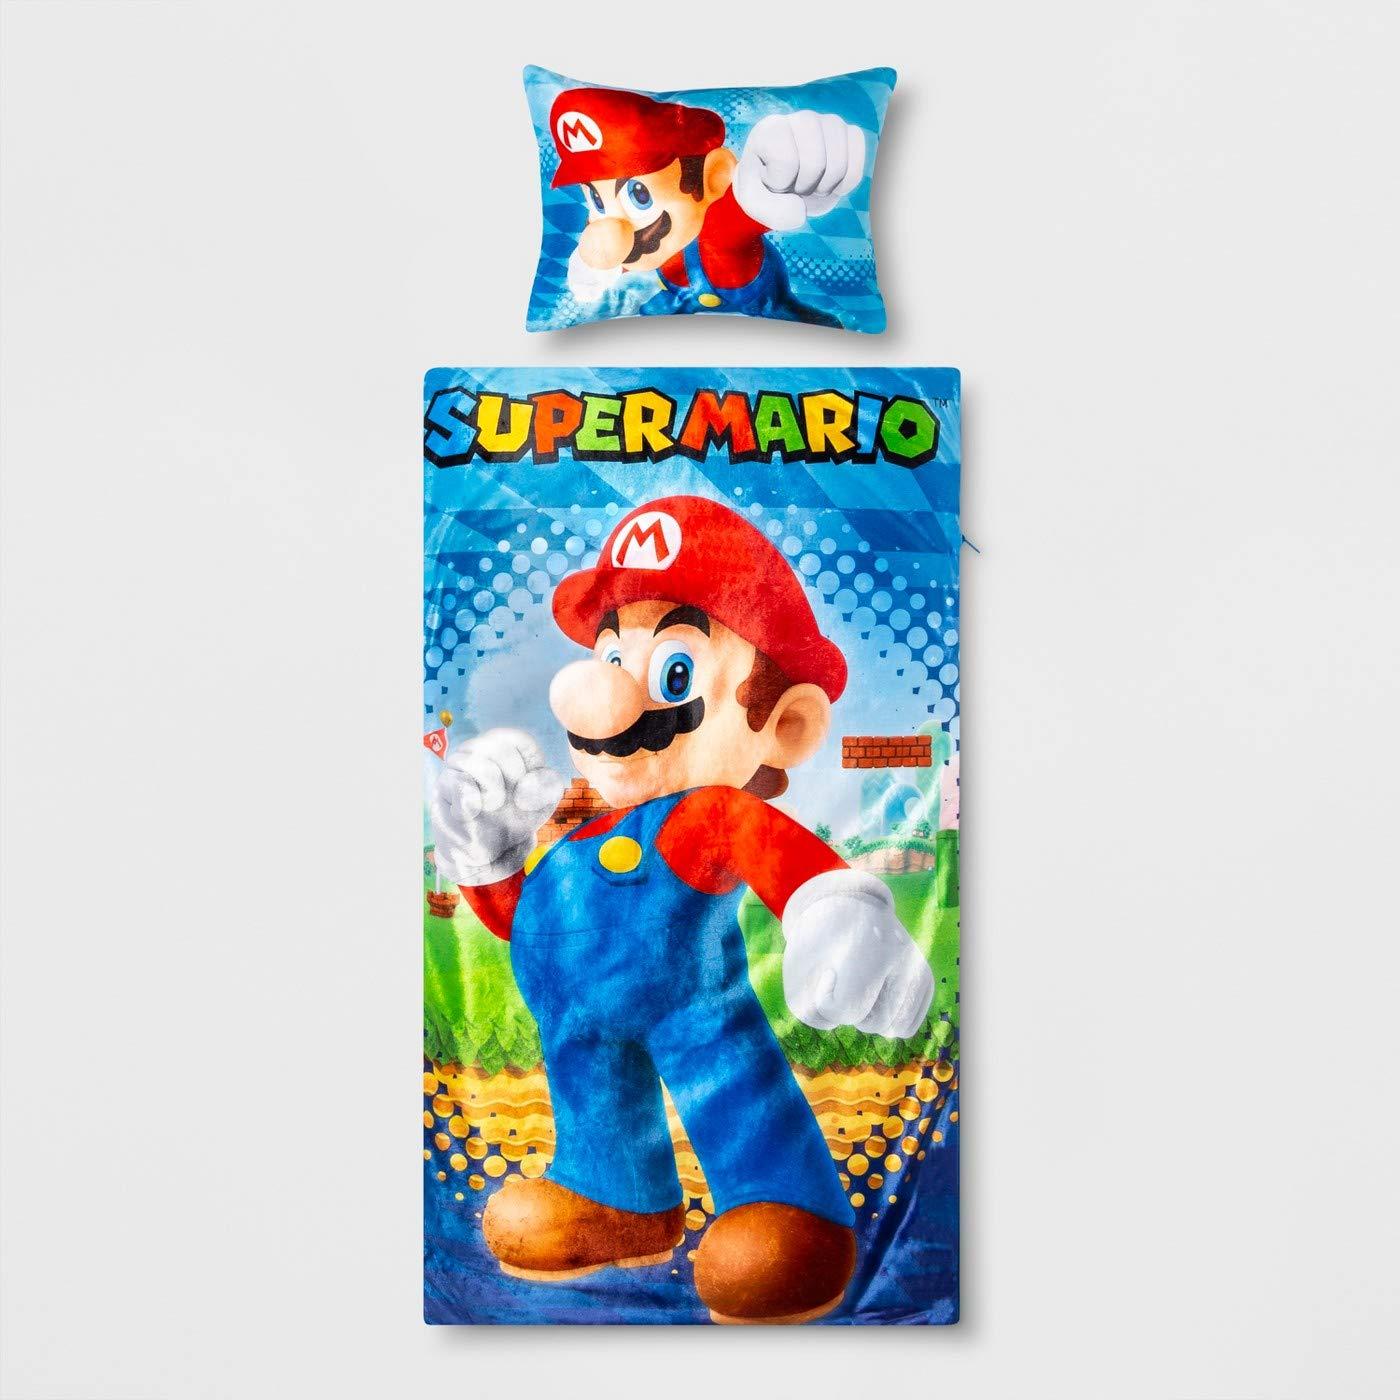 Super Mario Slumber Bag with Pillow by Super Mario